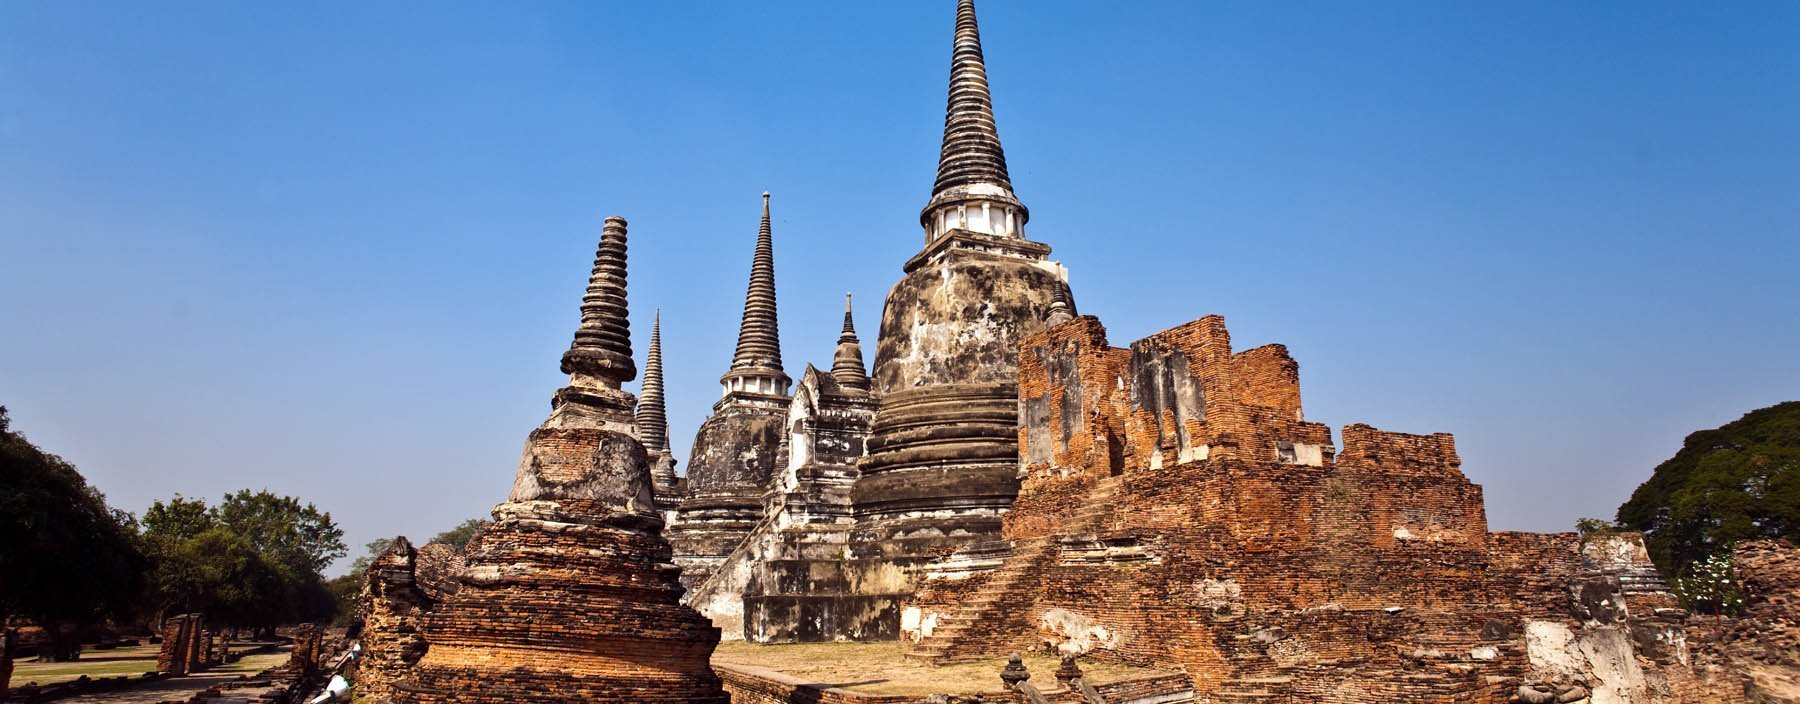 th, ayutthaya, wat phra sri sanphet (4).jpg